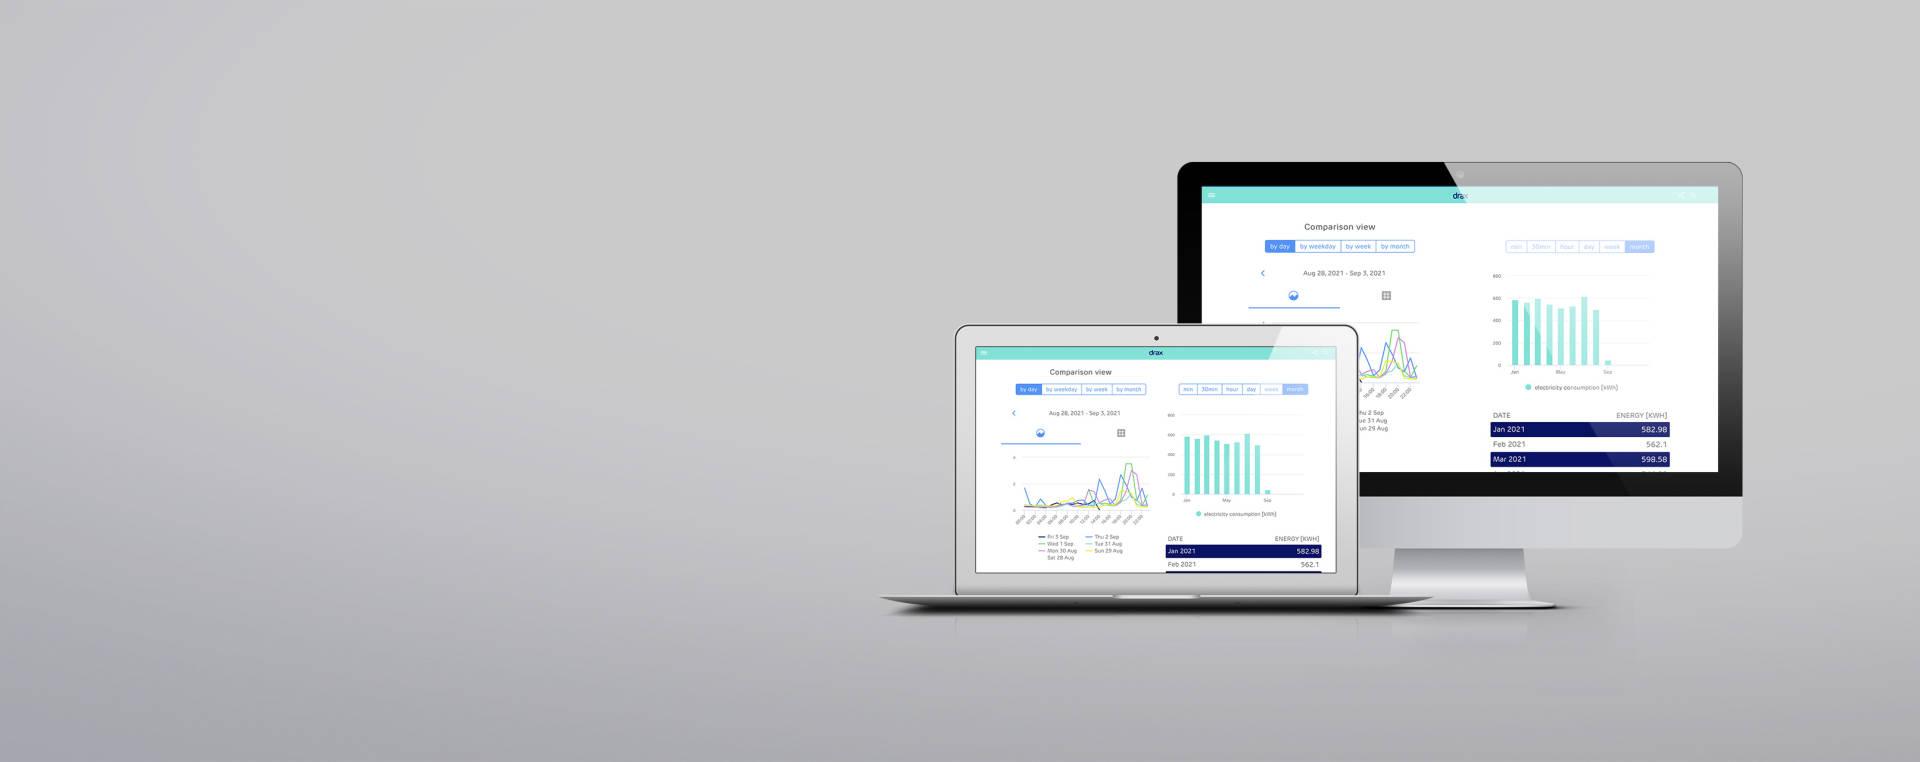 Drax-smart-app-tout